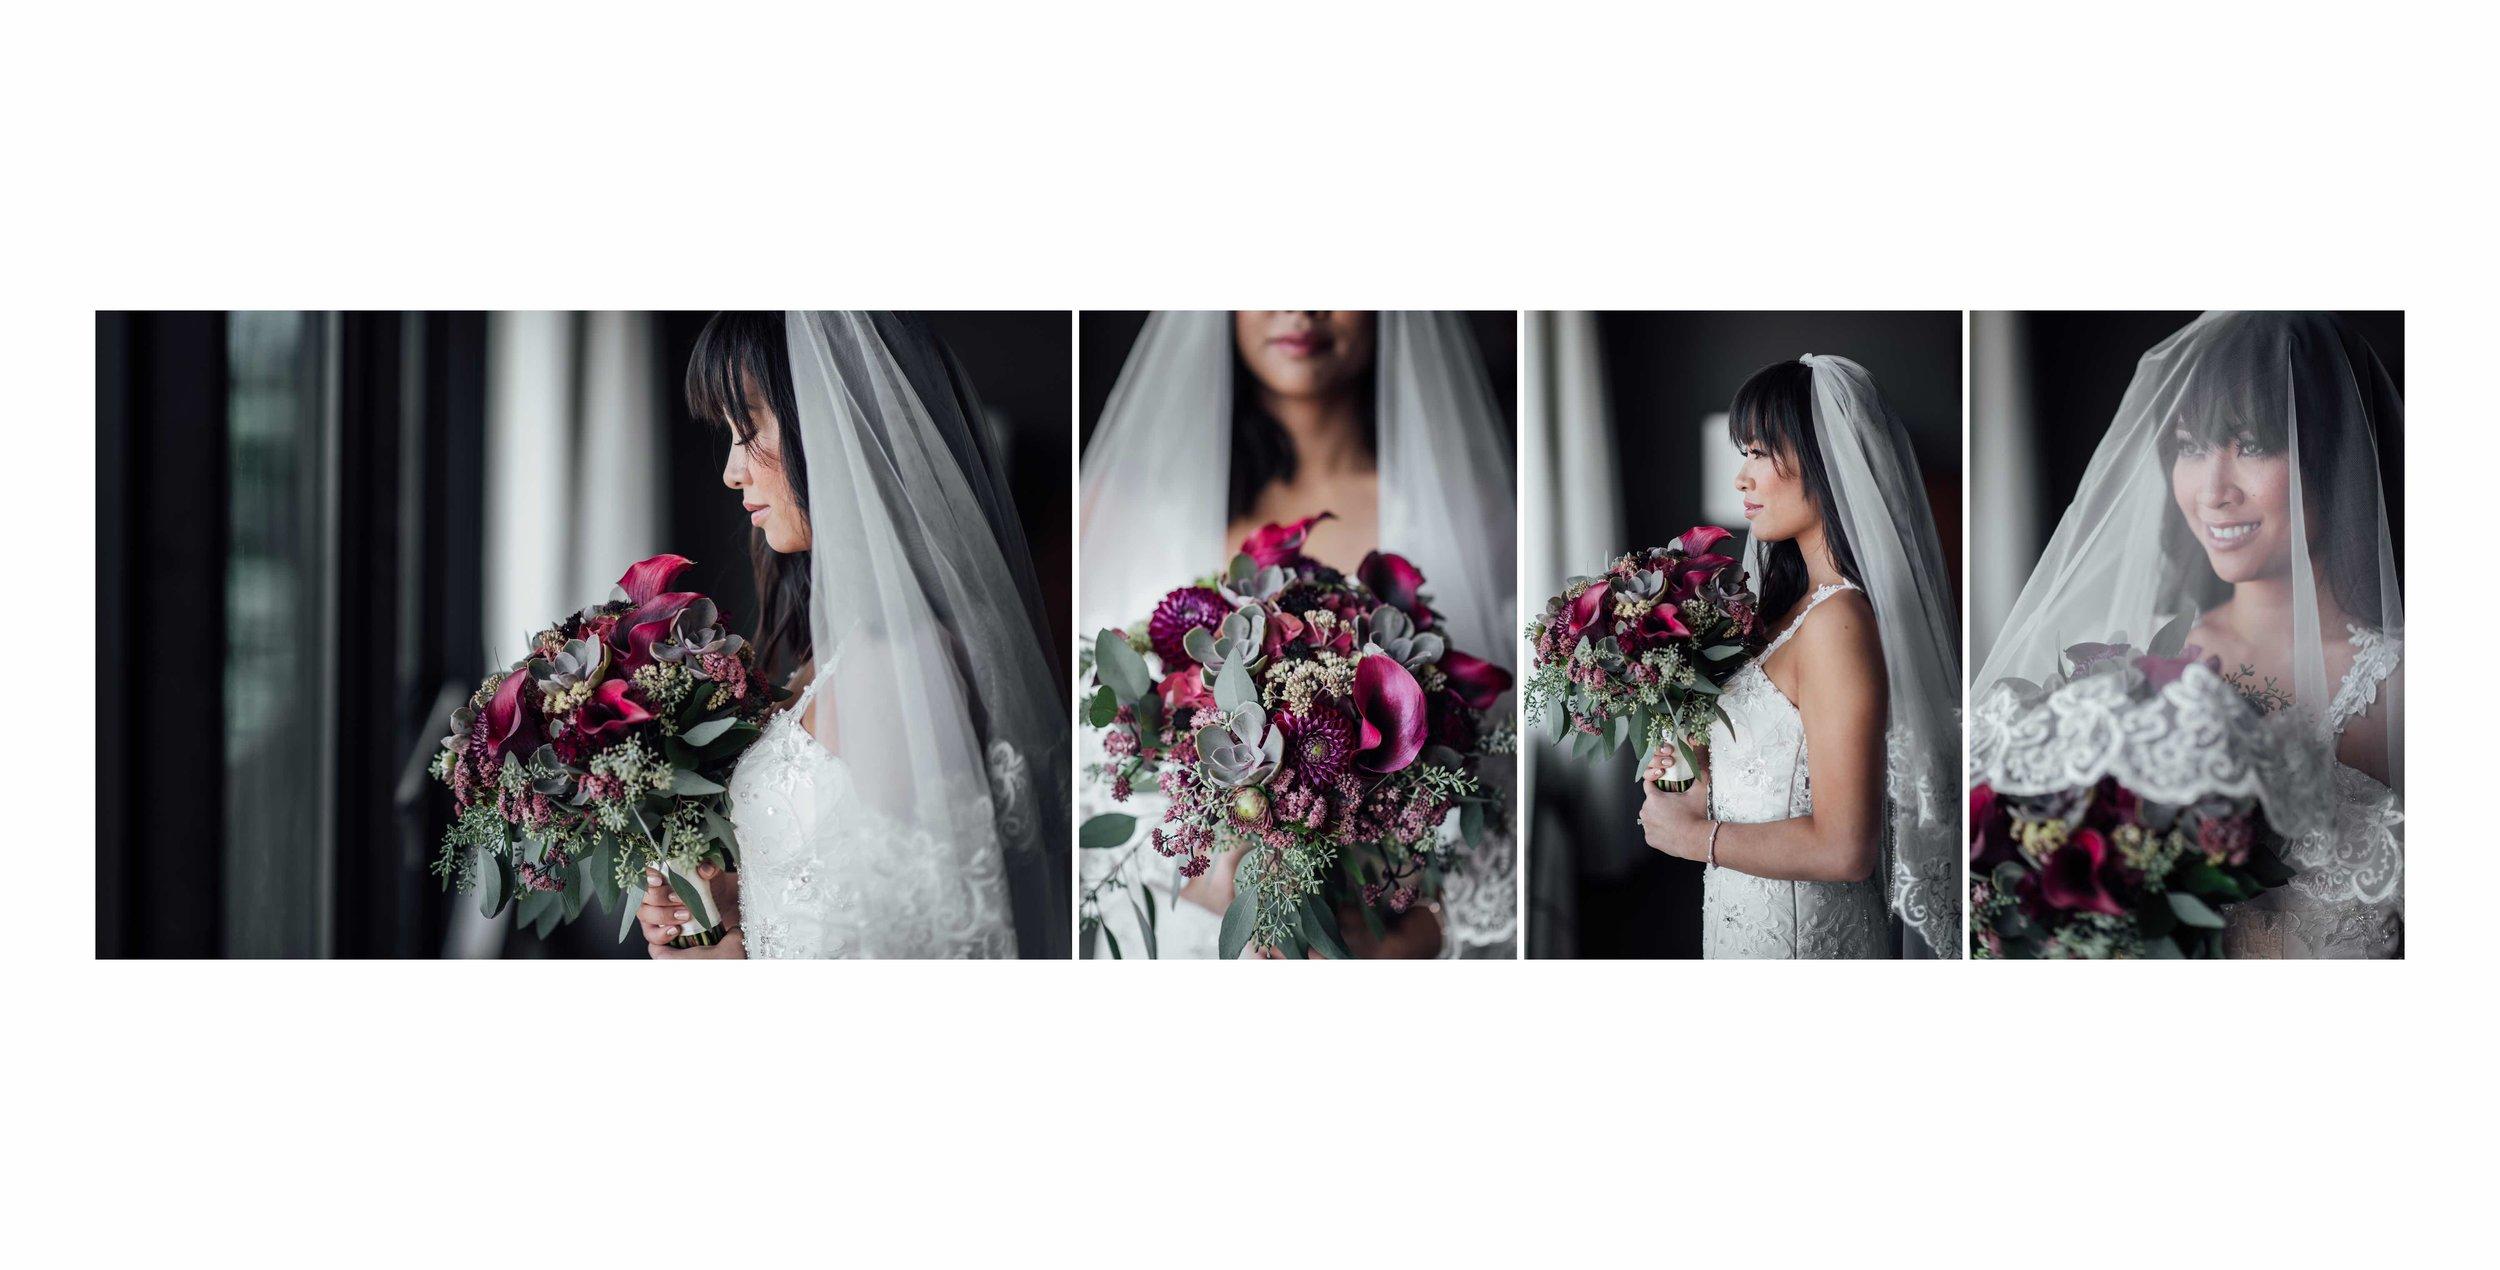 Lilianne+Minh-Quan_ _Wedding_07.jpg